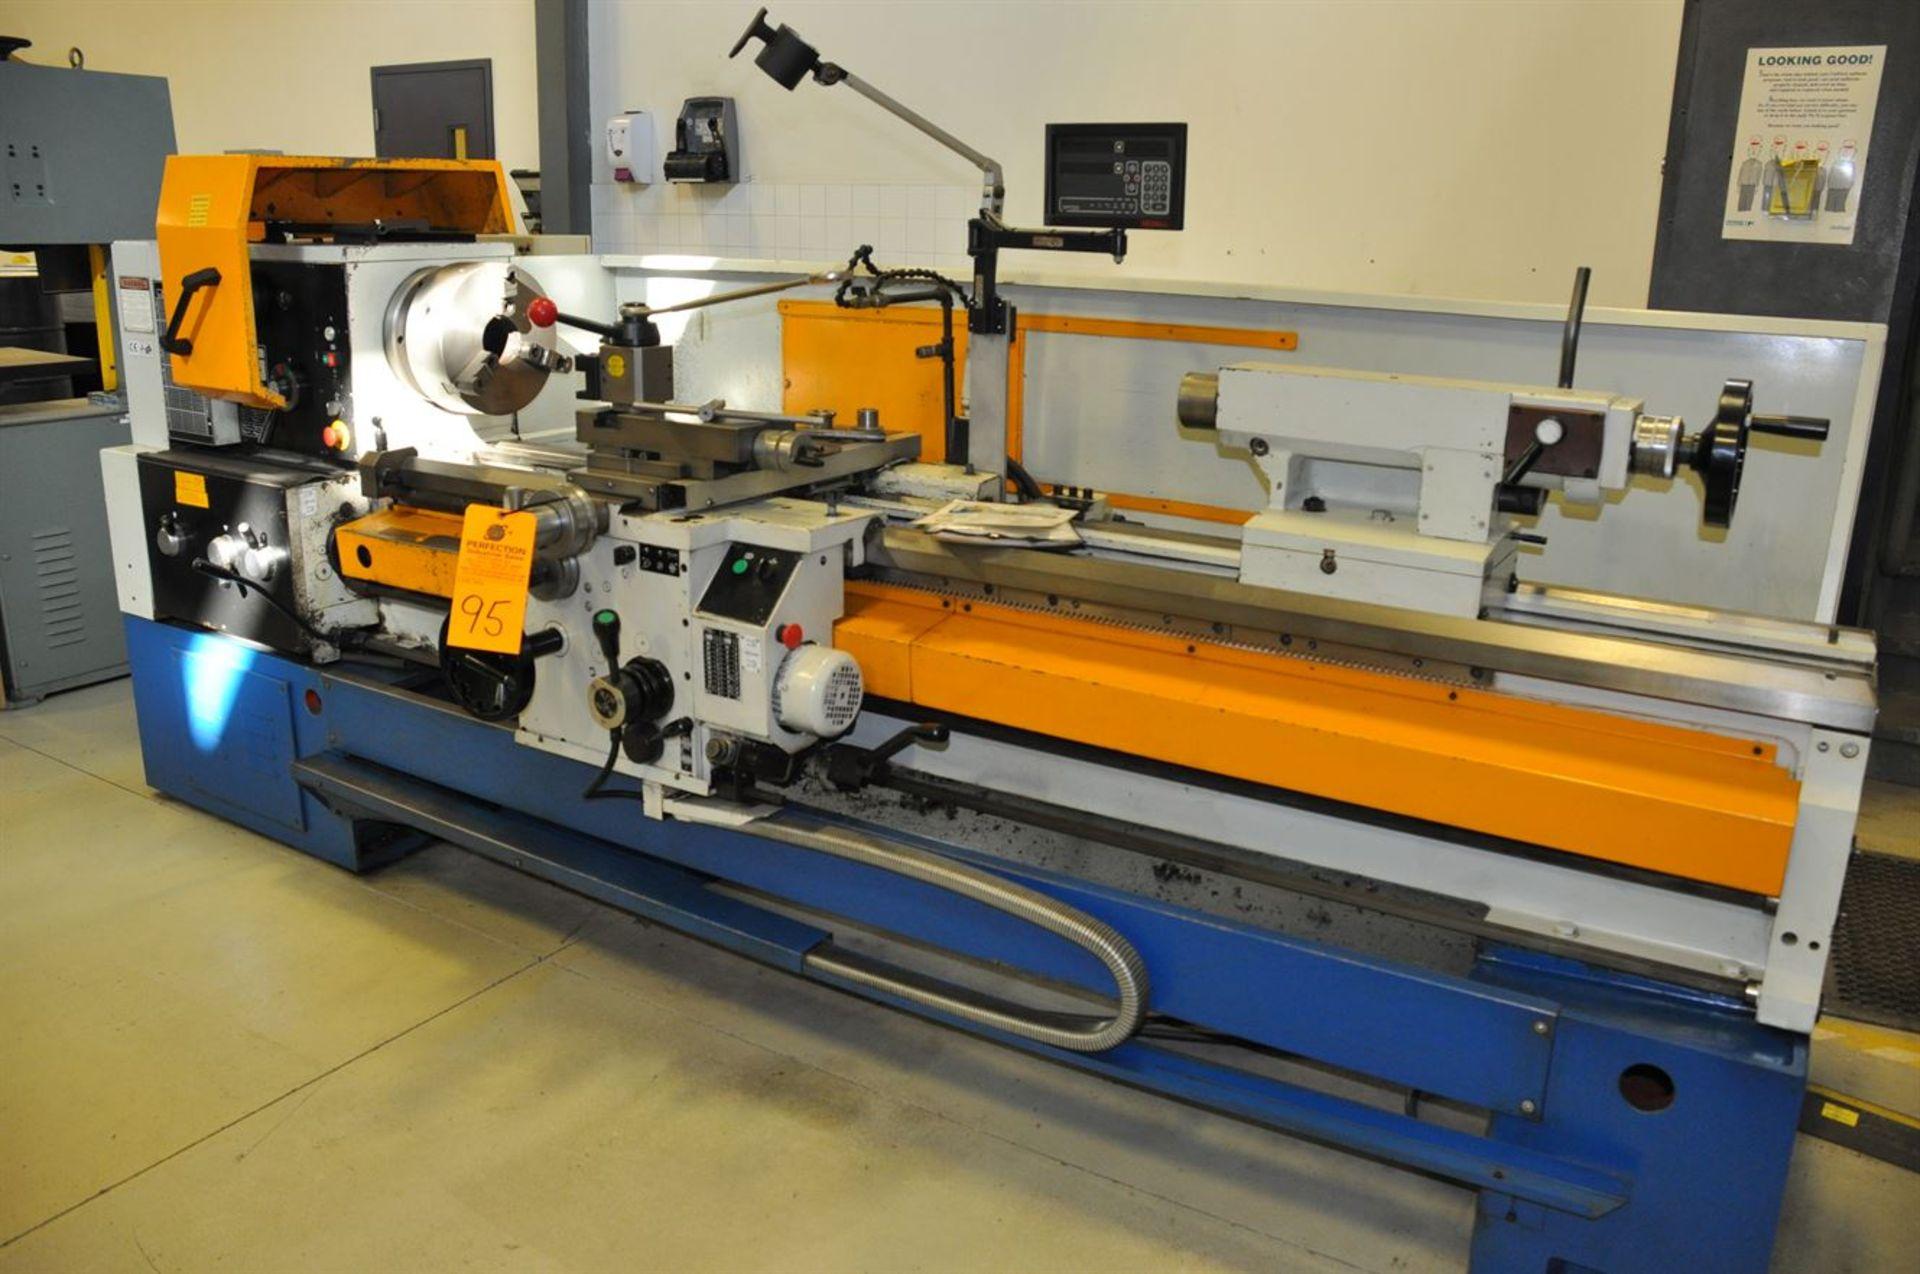 2012 SUMMIT 20X80B Gap Bed Engine Lathe, s/n 8052, w/ Taper Attachment, Quick Change Tool Post,